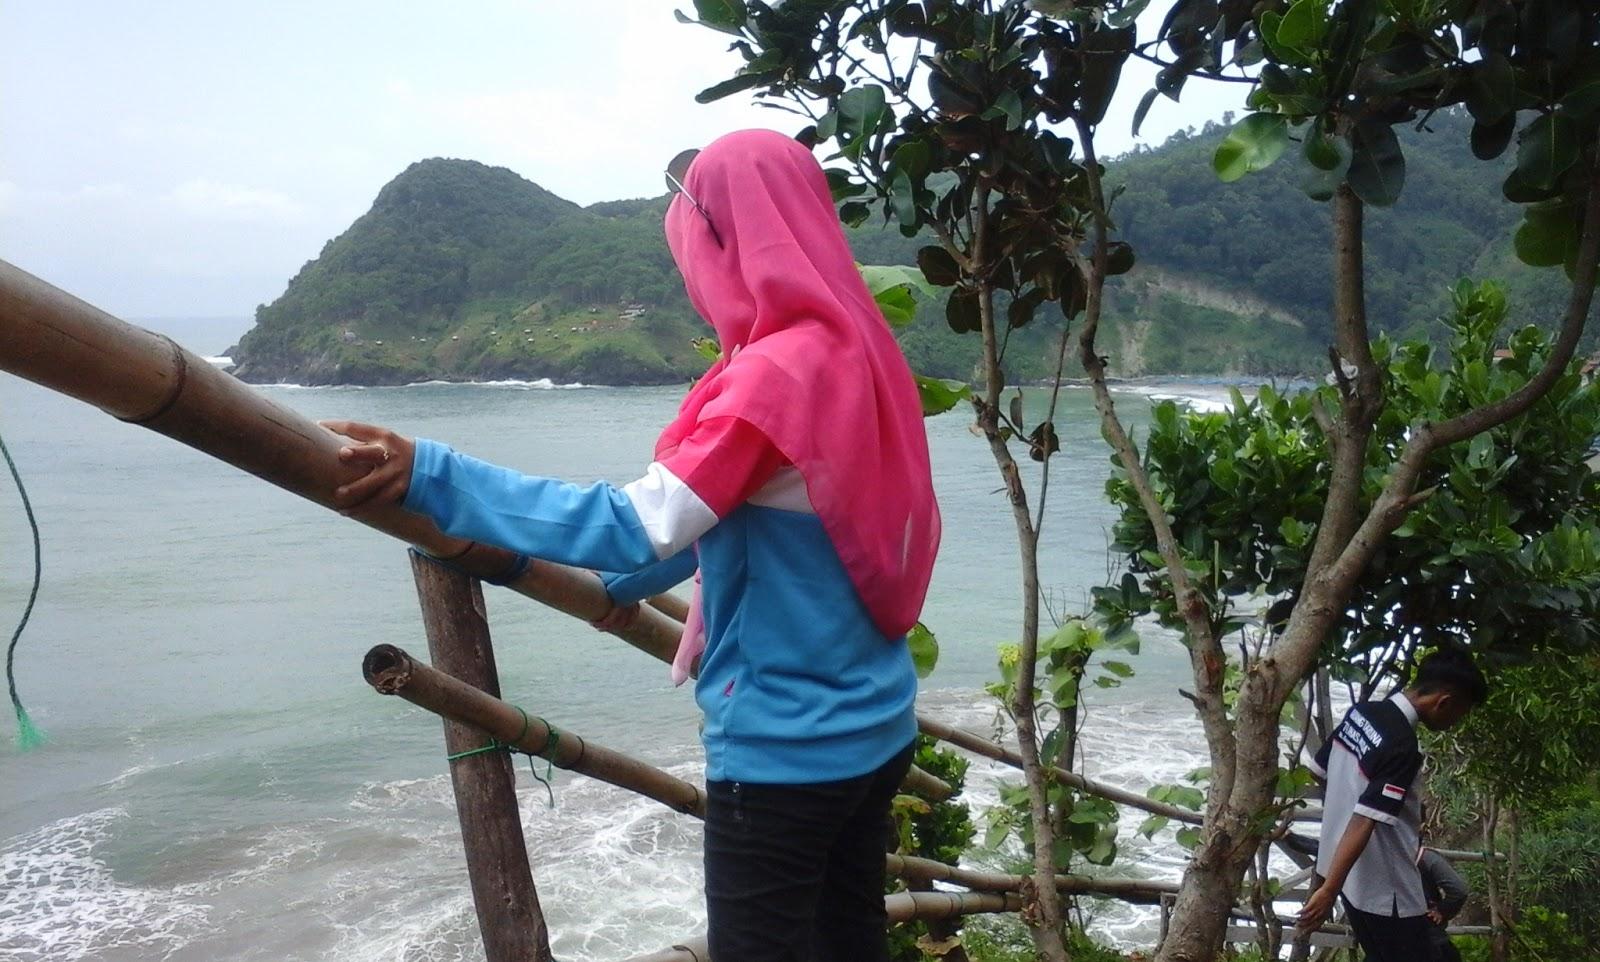 Wah Kebumen Punya Pantai Kece Wow Wisata Unik Lho Berikut